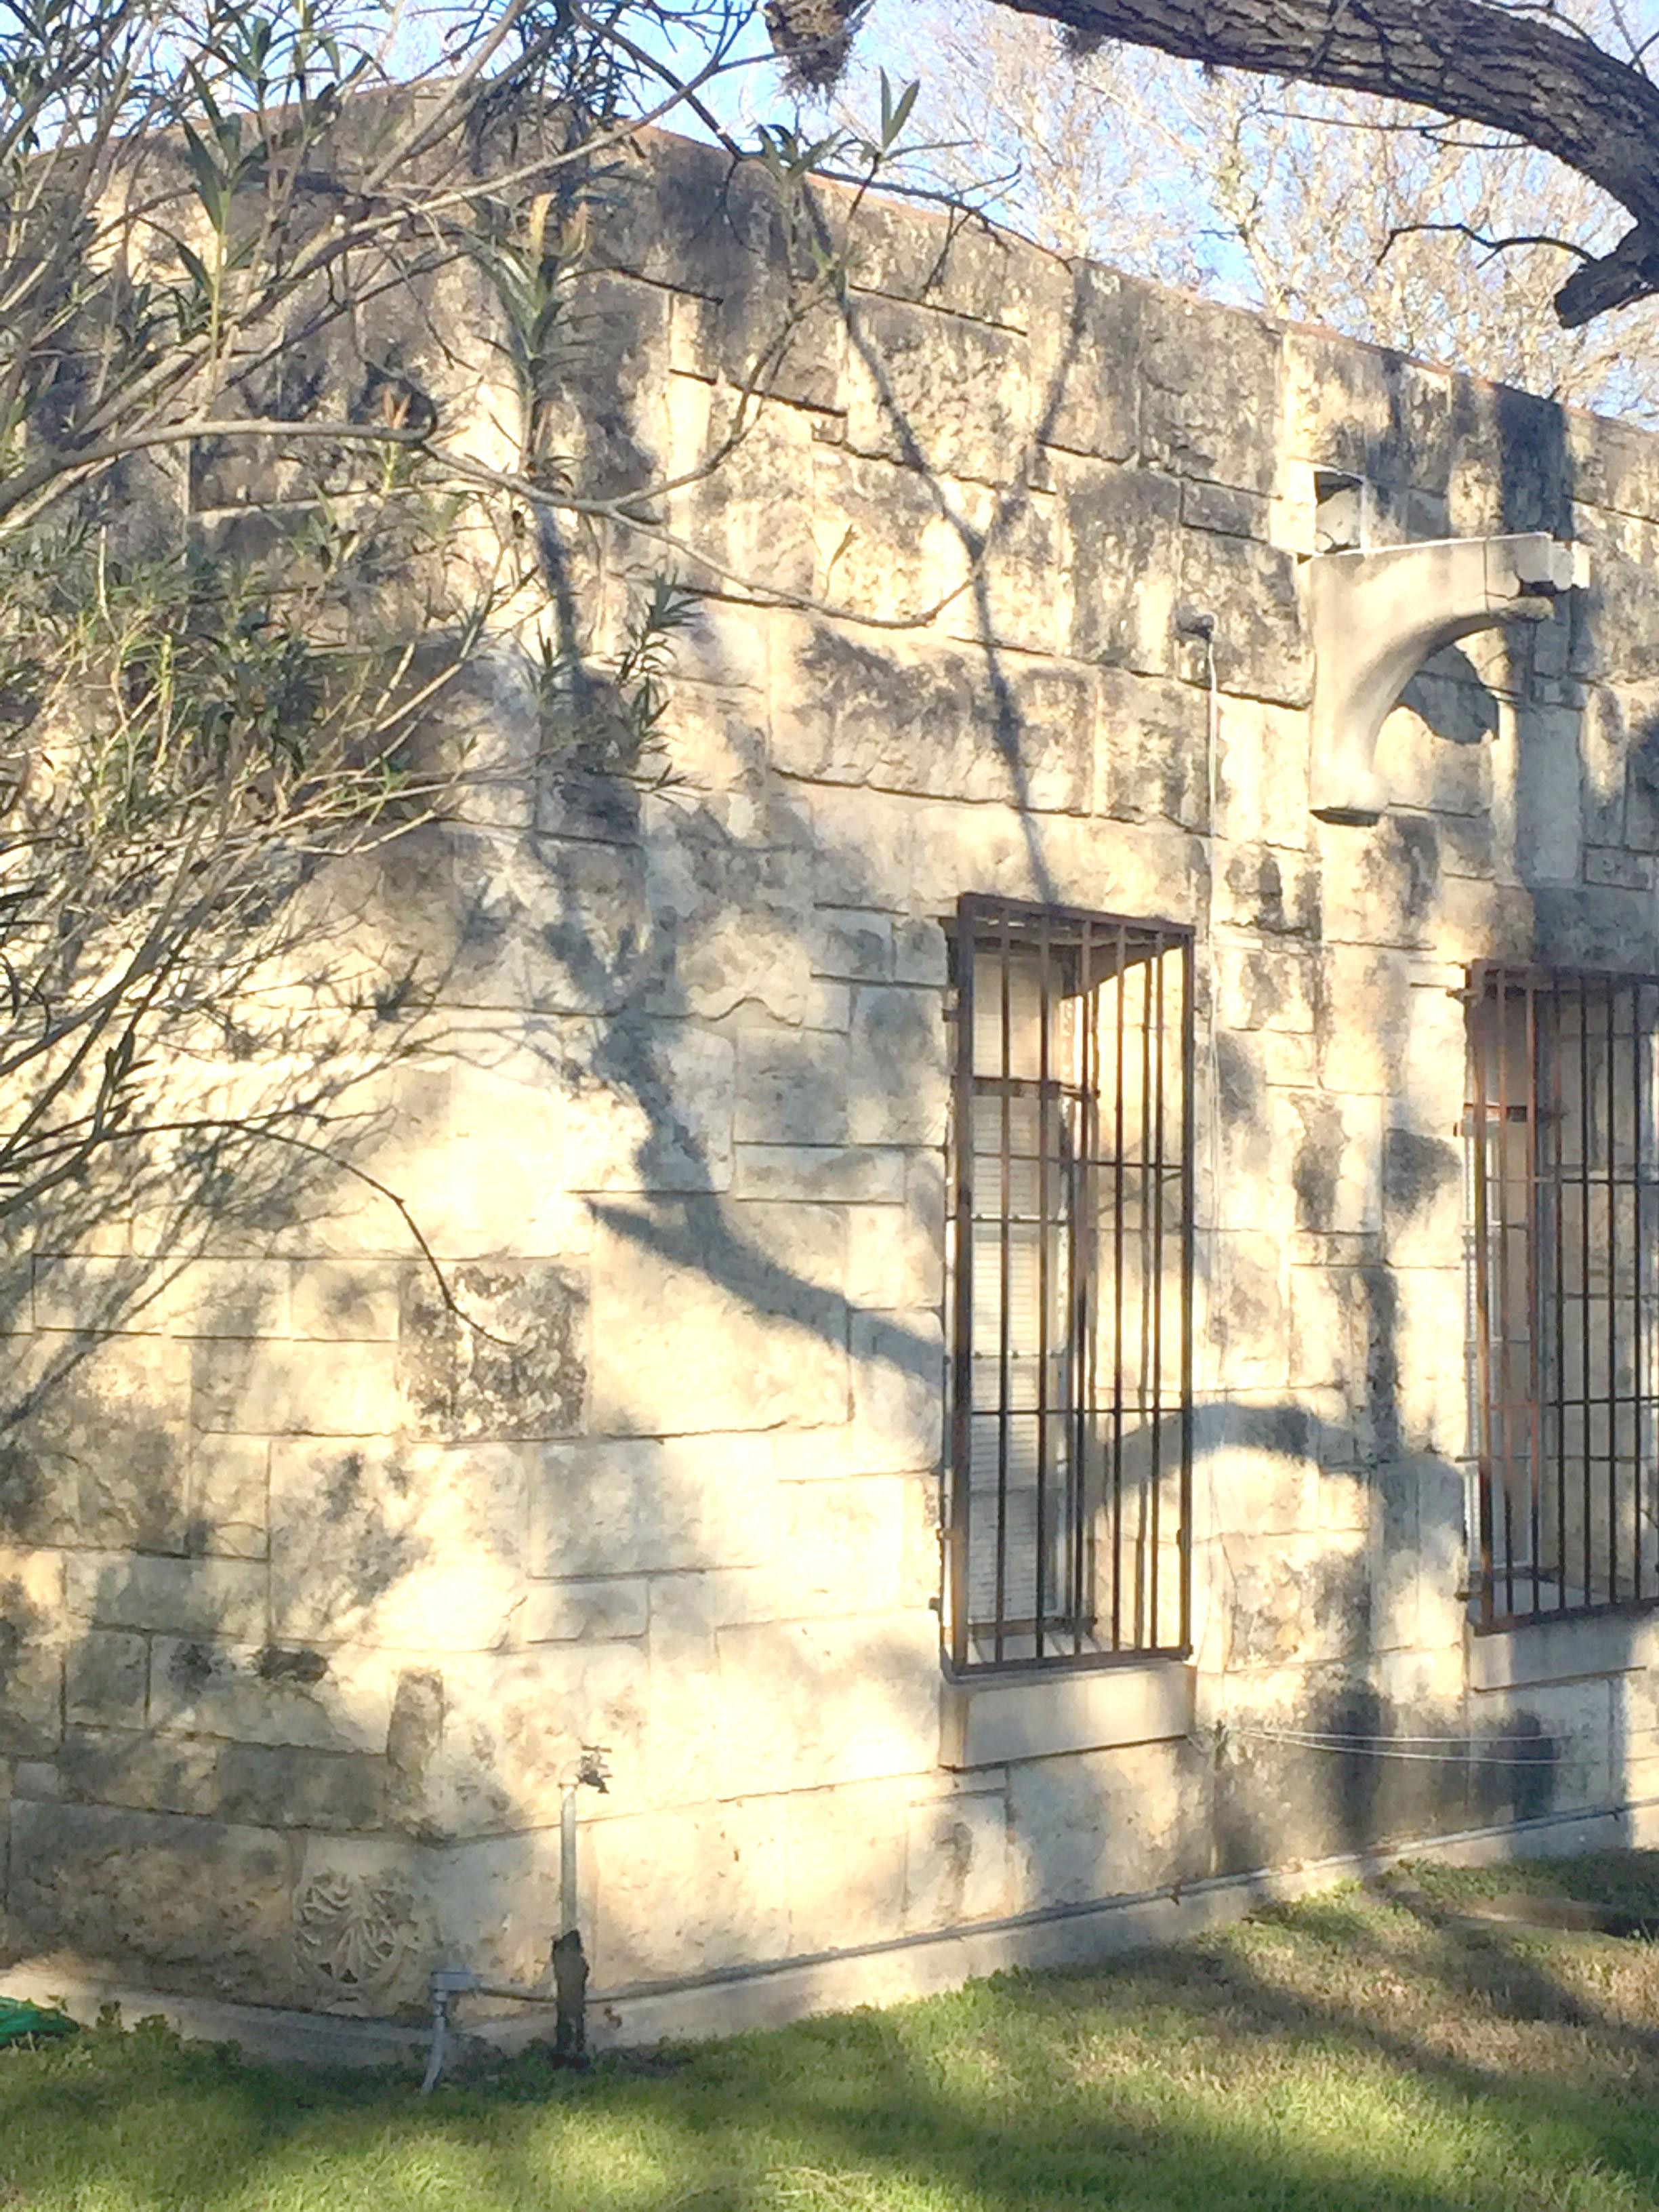 Mission Espada Priest House Stone Detail.JPG